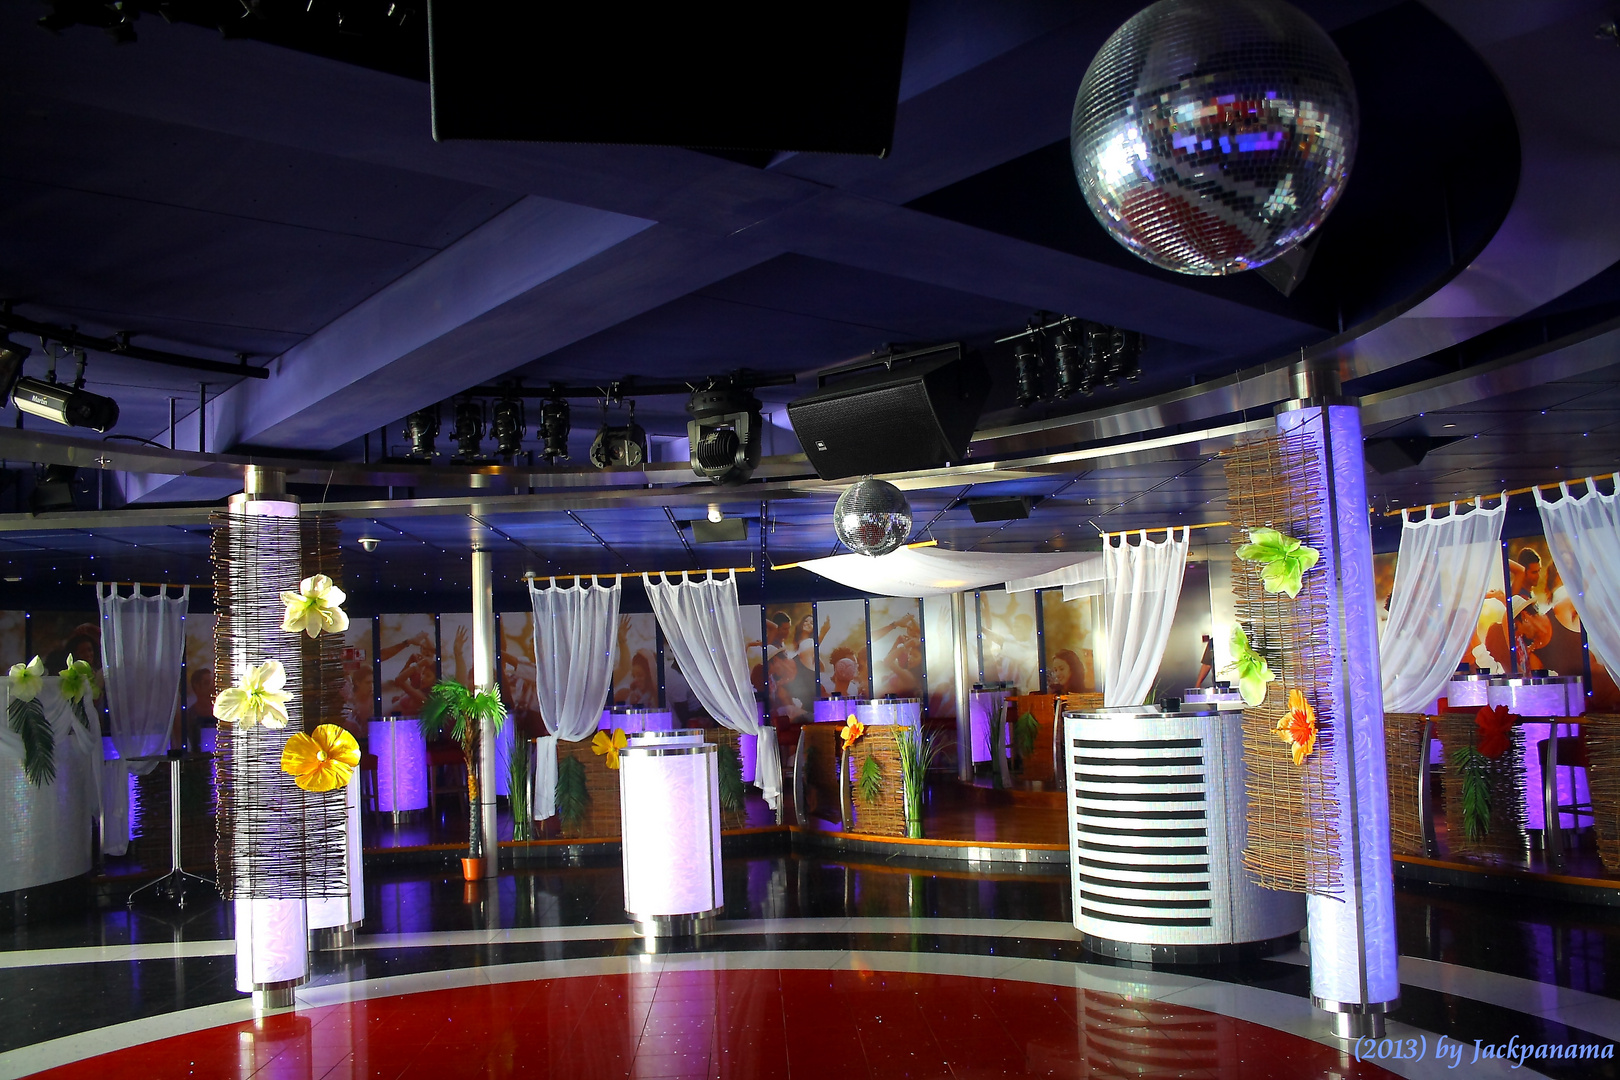 Anytime-Bar mit Discothek